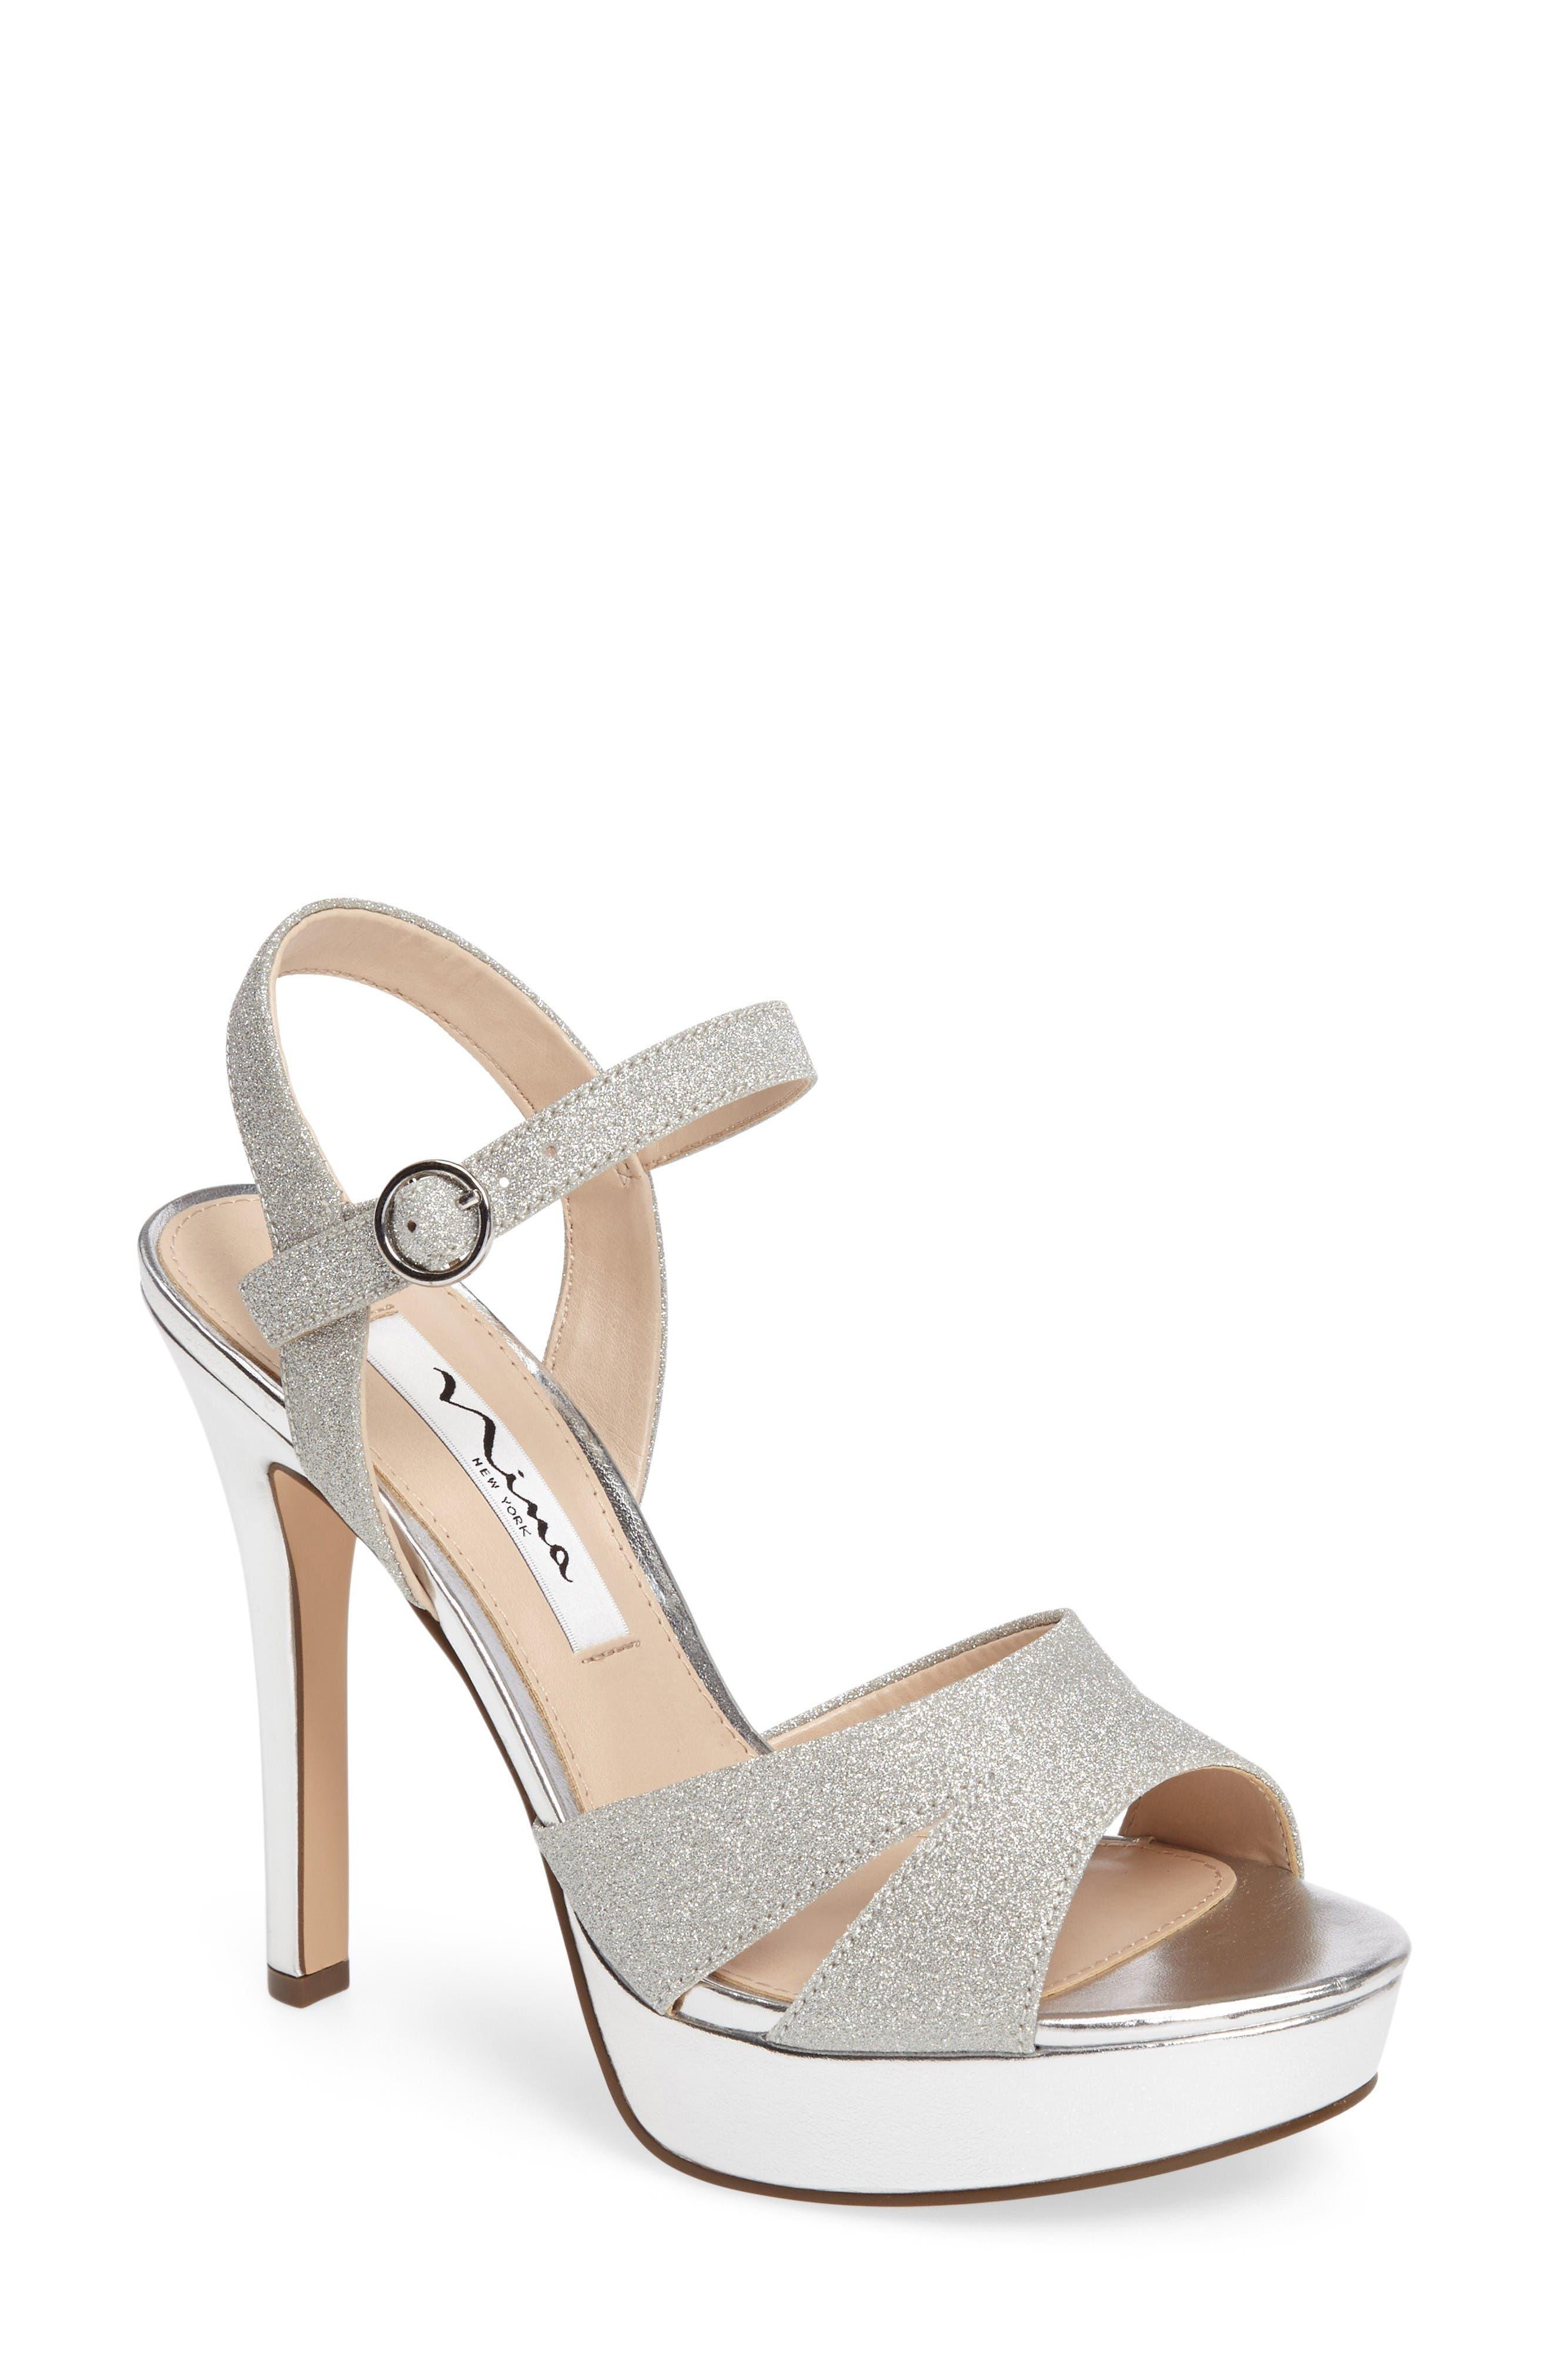 Alternate Image 1 Selected - Nina Shara Shimmery Platform Sandal (Women)